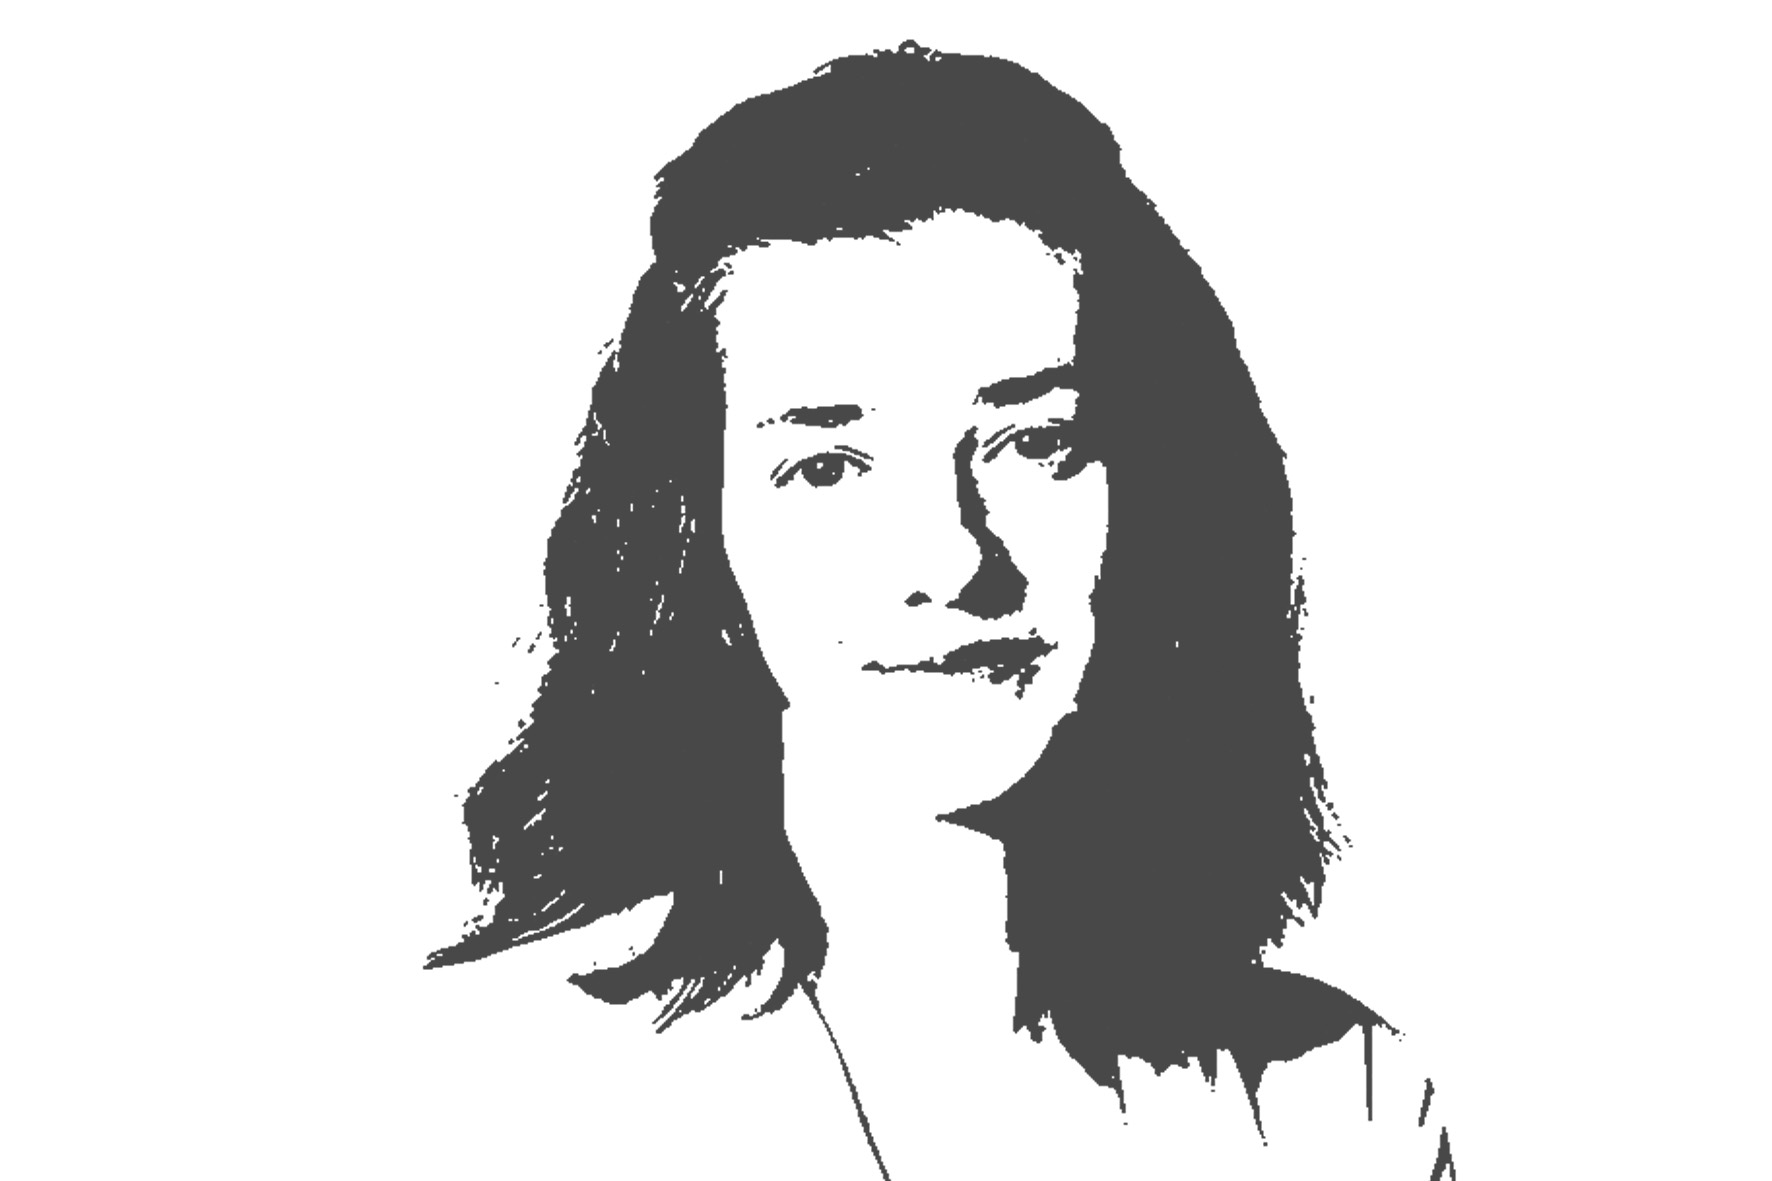 by María Esteve and Carmen Julia Corrales